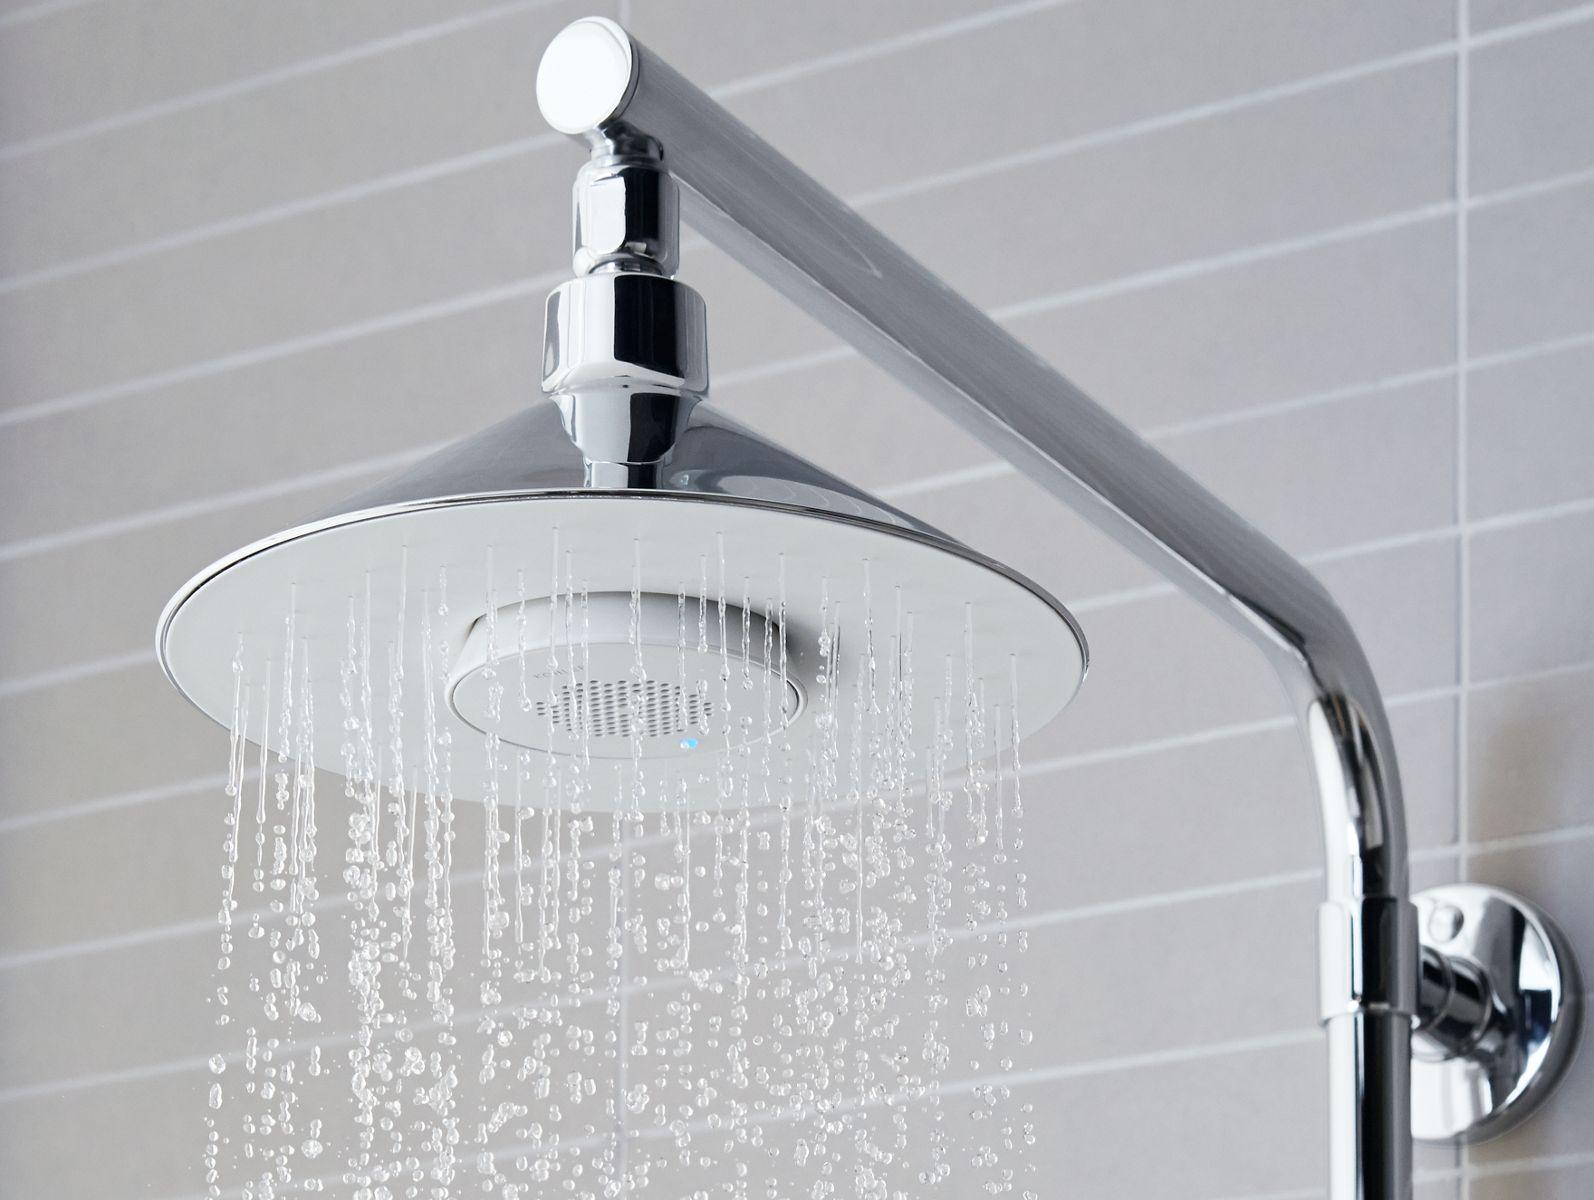 Moxie 174 Showerhead Wireless Speaker Bathroom New